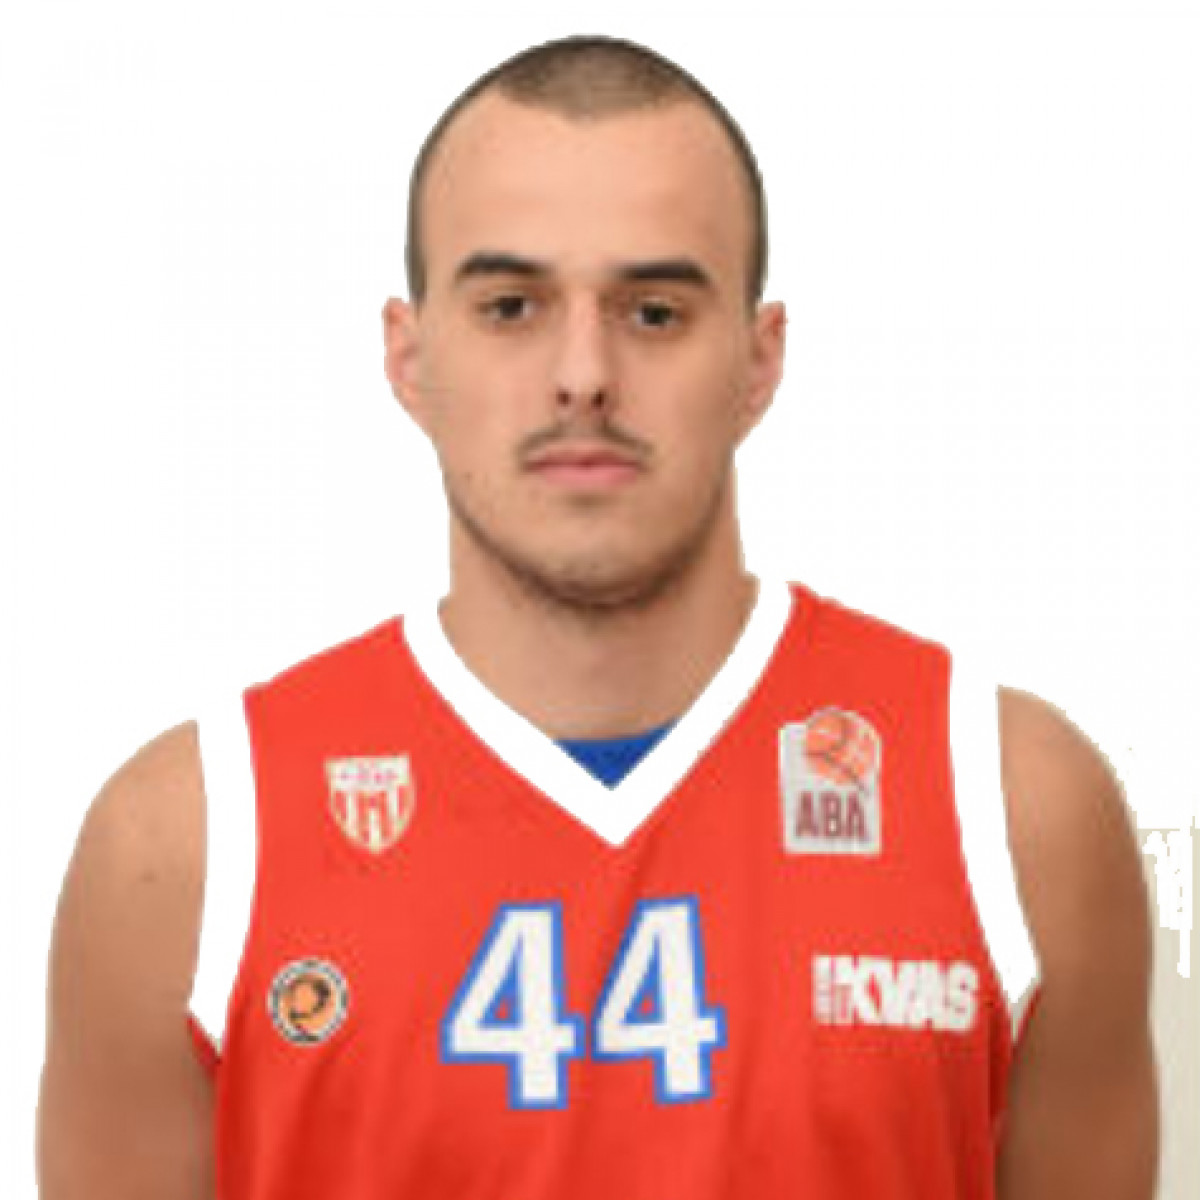 Photo of Uros Carapic, 2018-2019 season